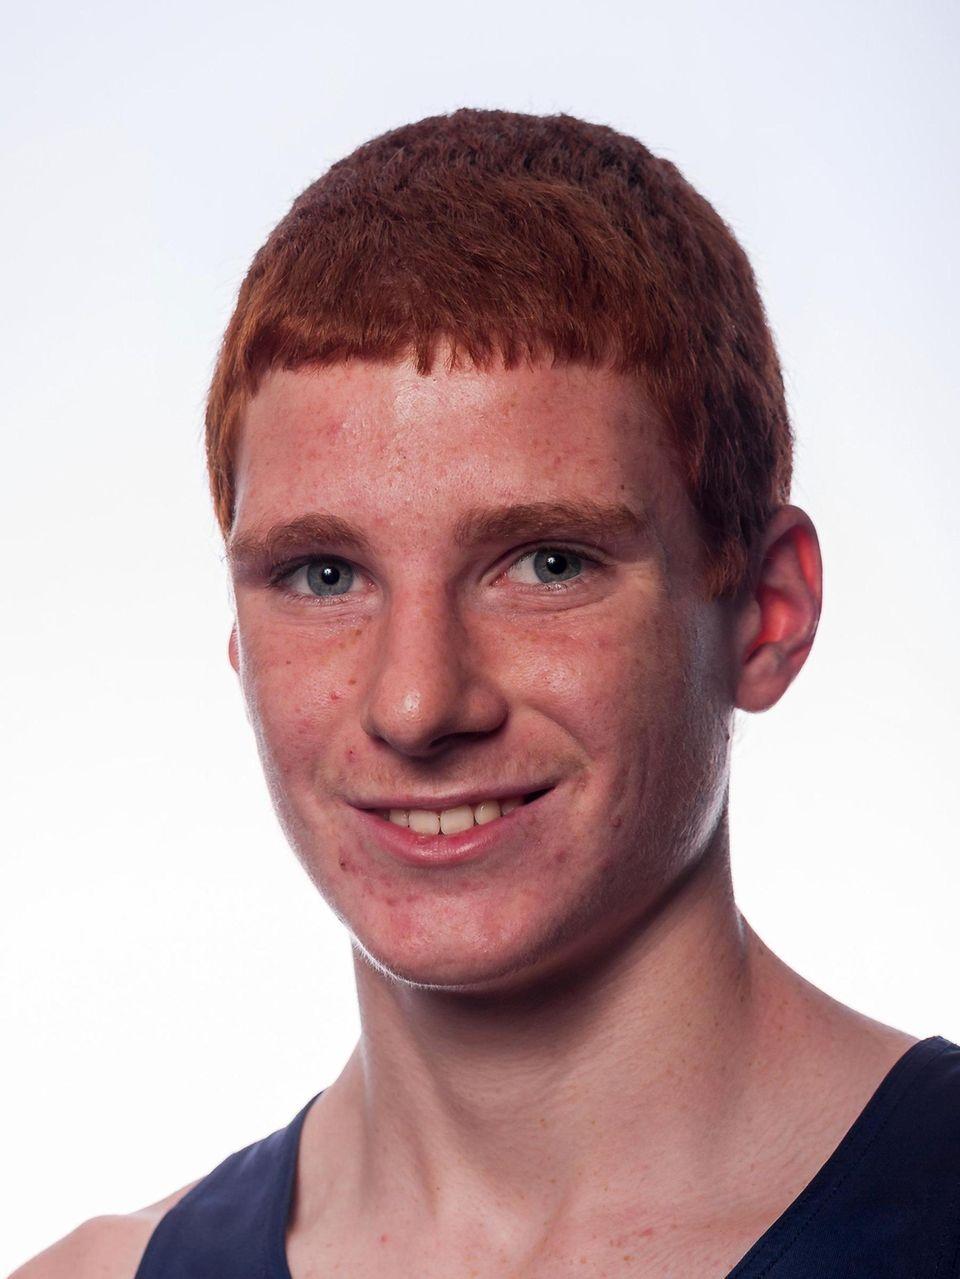 He was the best Class B runner in